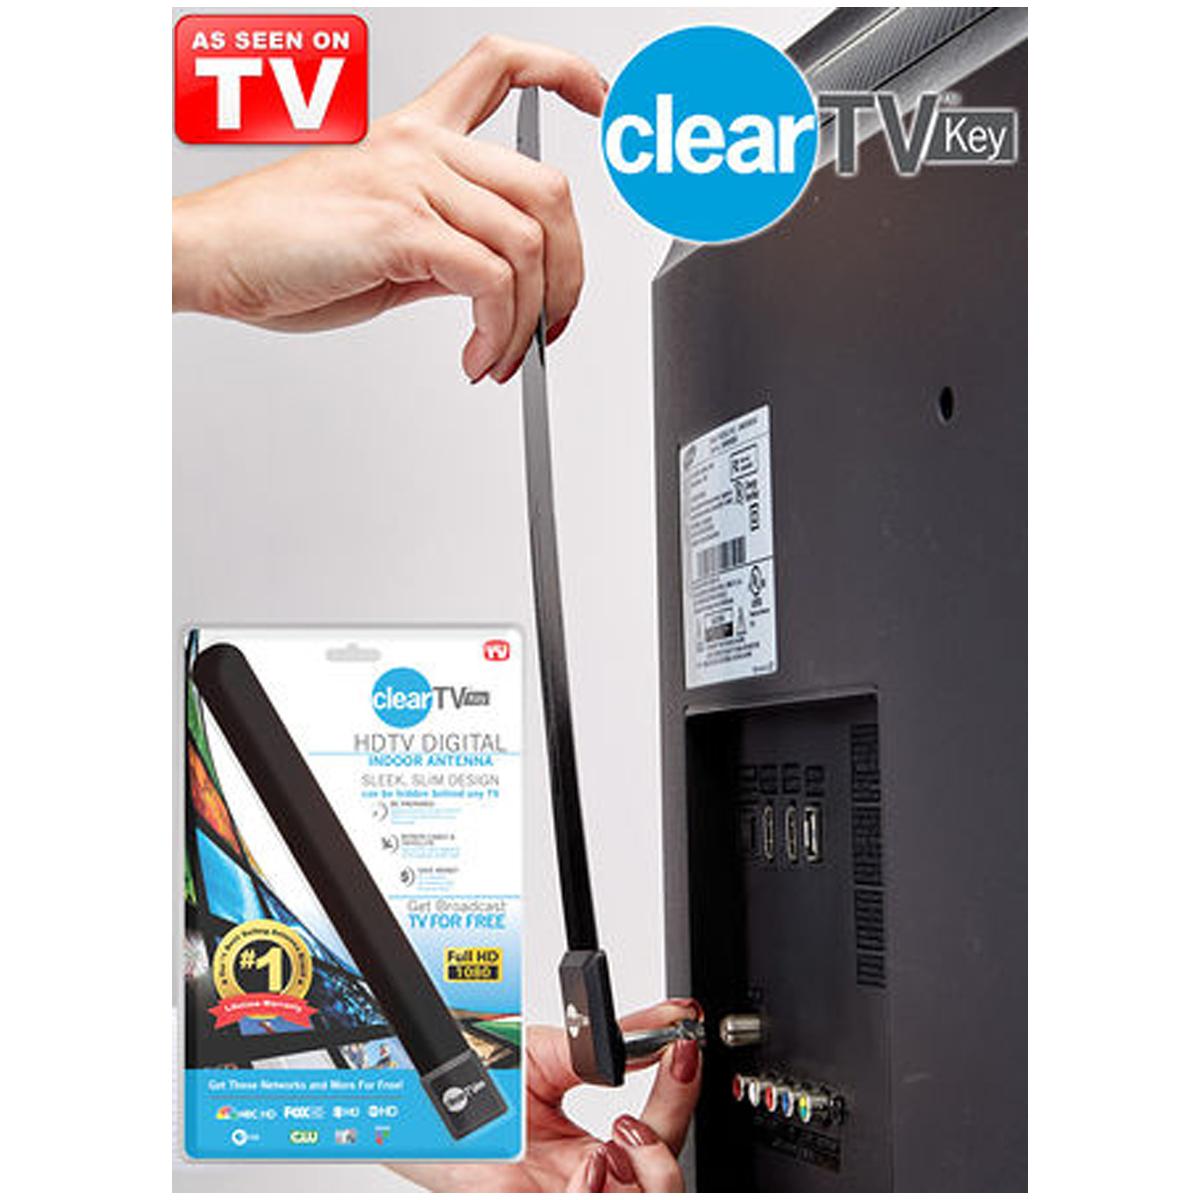 Clear TV Key